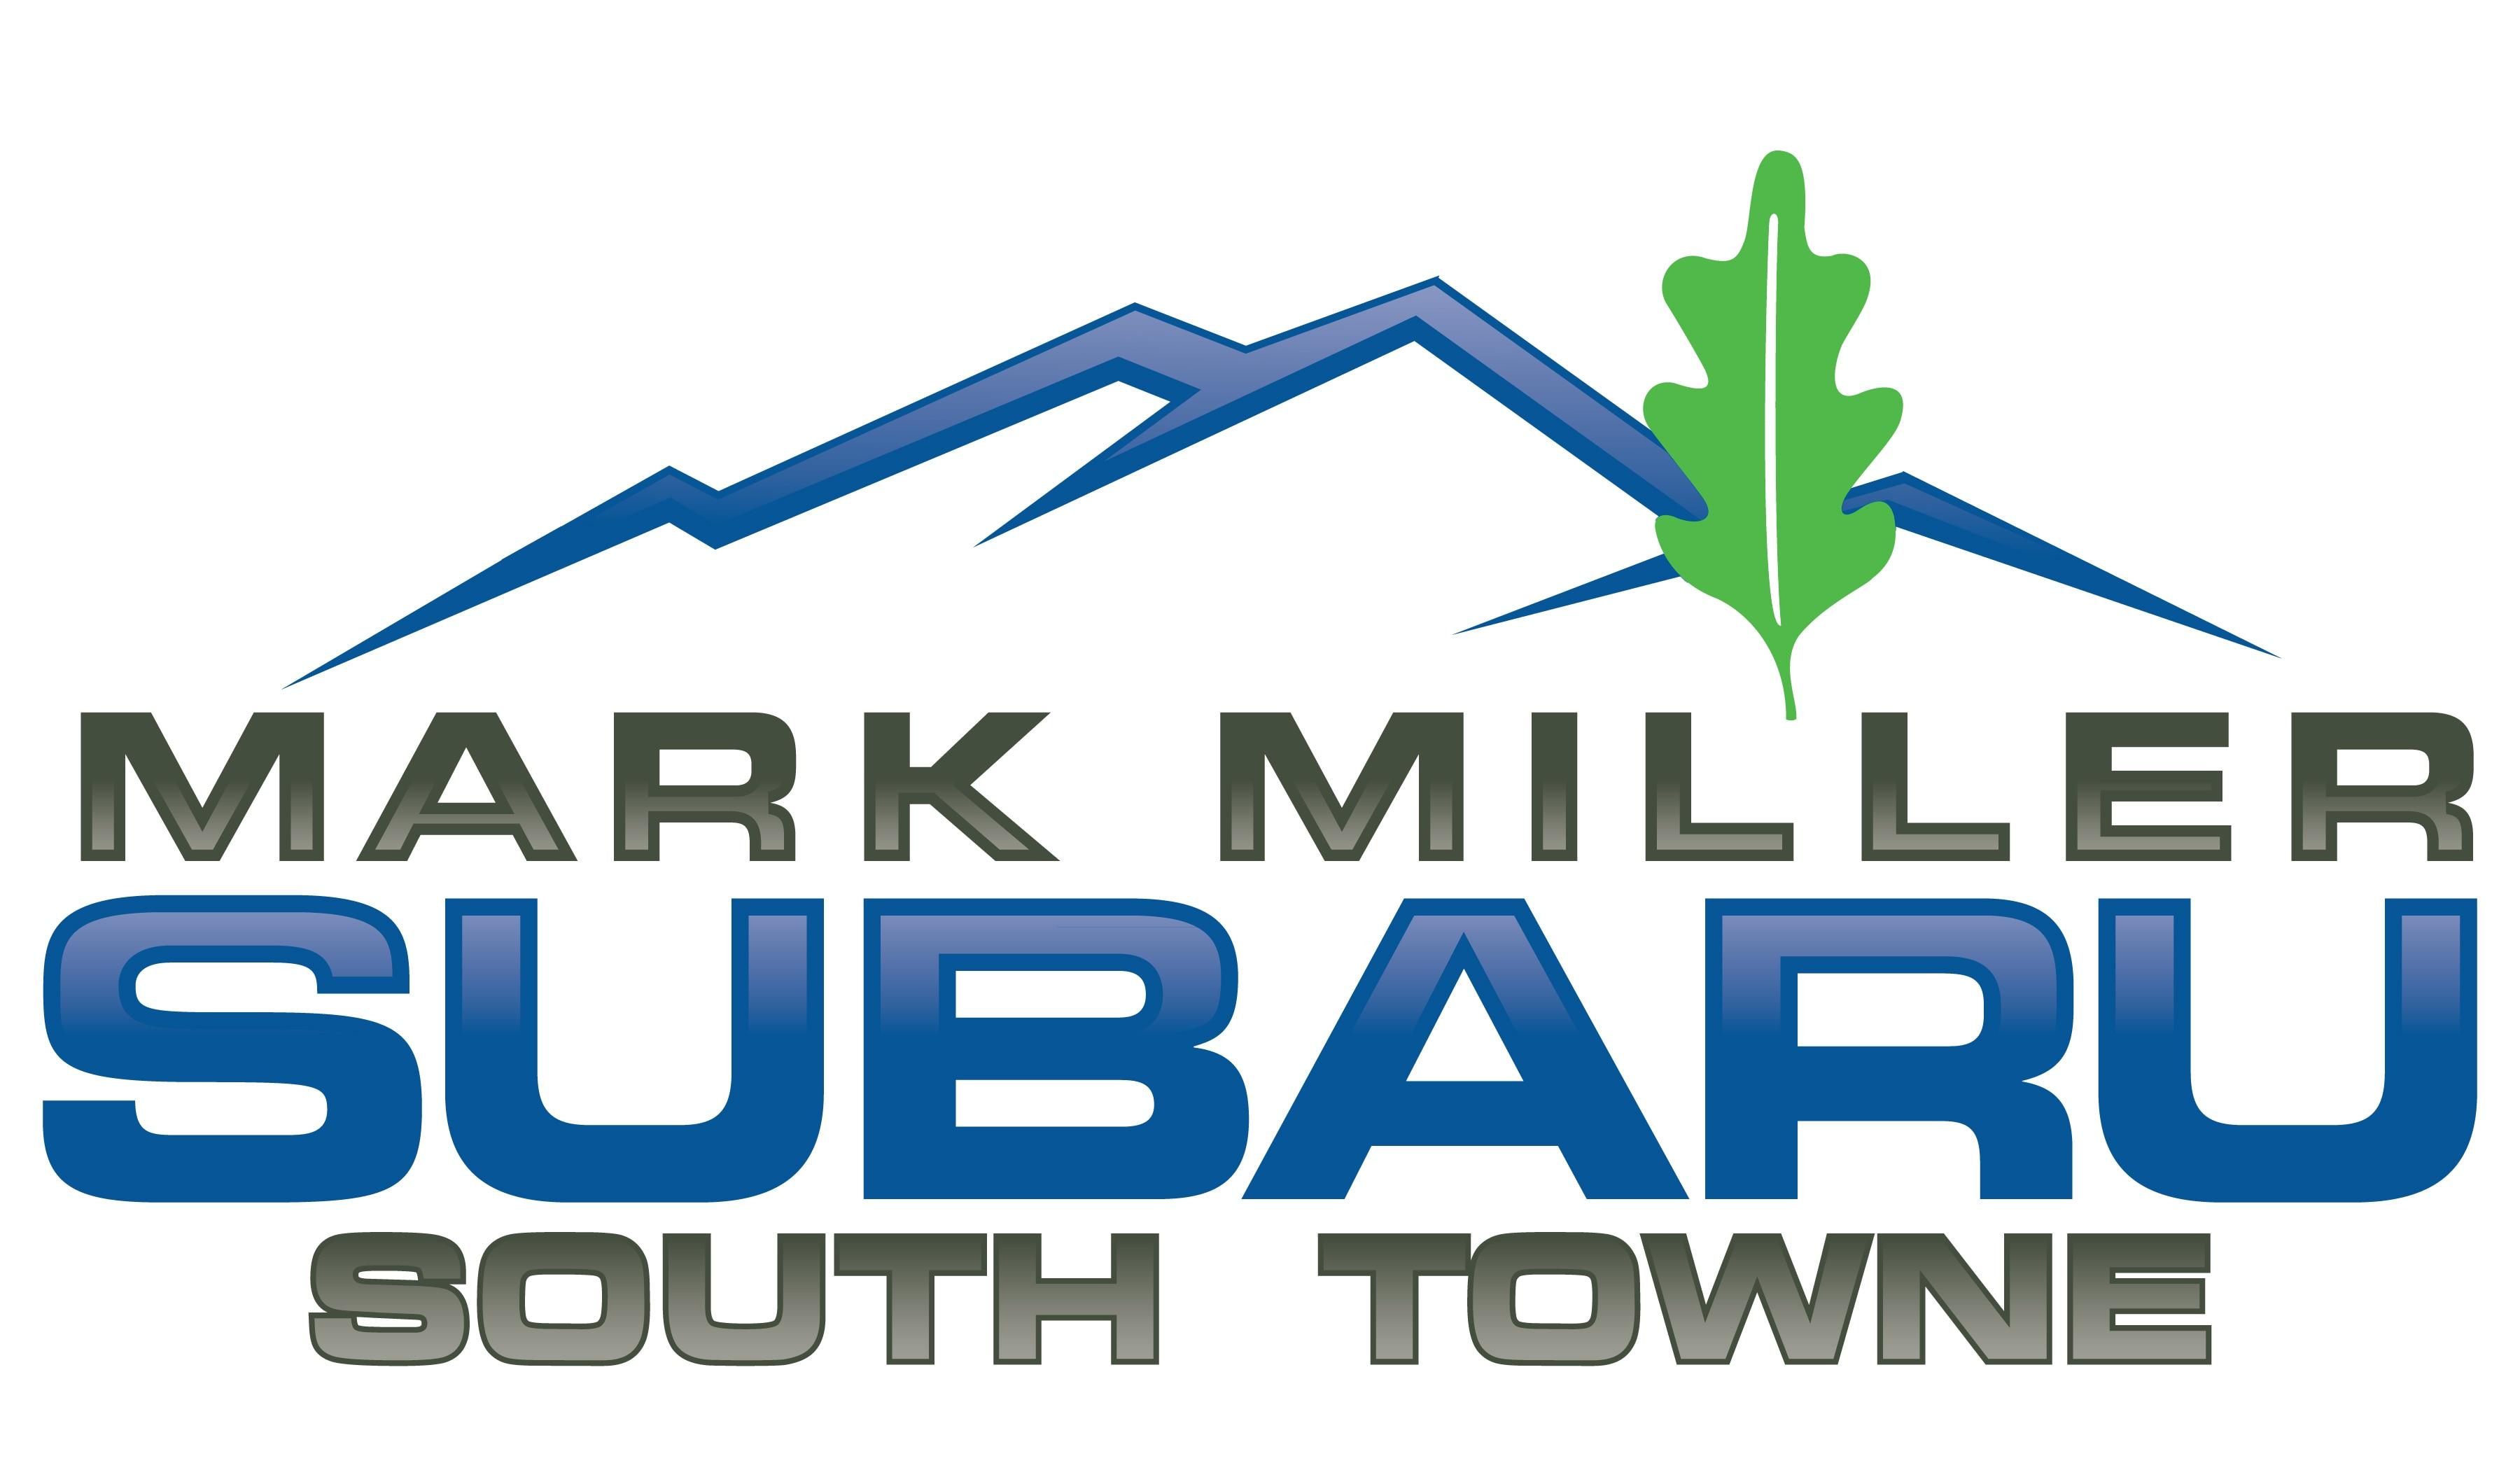 Mark Miller Subaru Southtowne >> Mark Miller Subaru | Subaru Parts Center in Salt Lake City